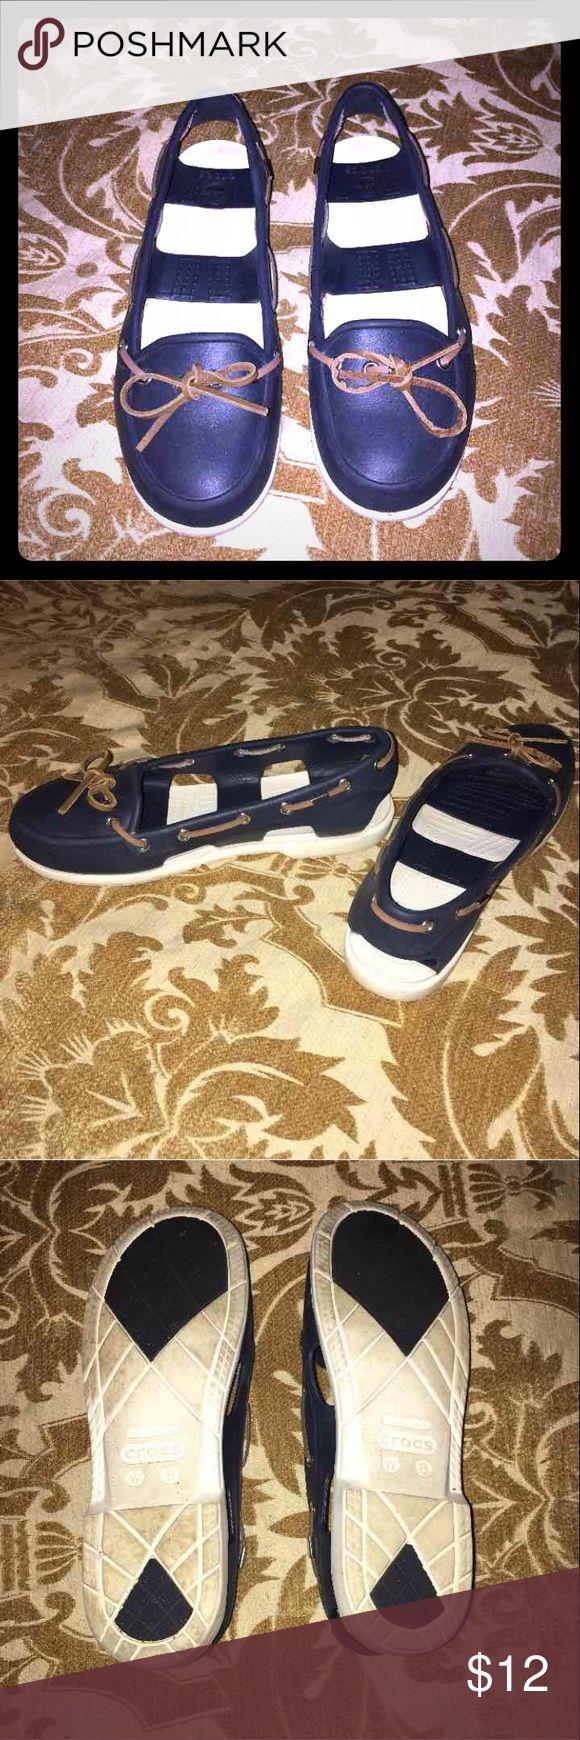 Crocs shoe Women's crocs shoe size 8. Only worn once before! CROCS Shoes Flats & Loafers